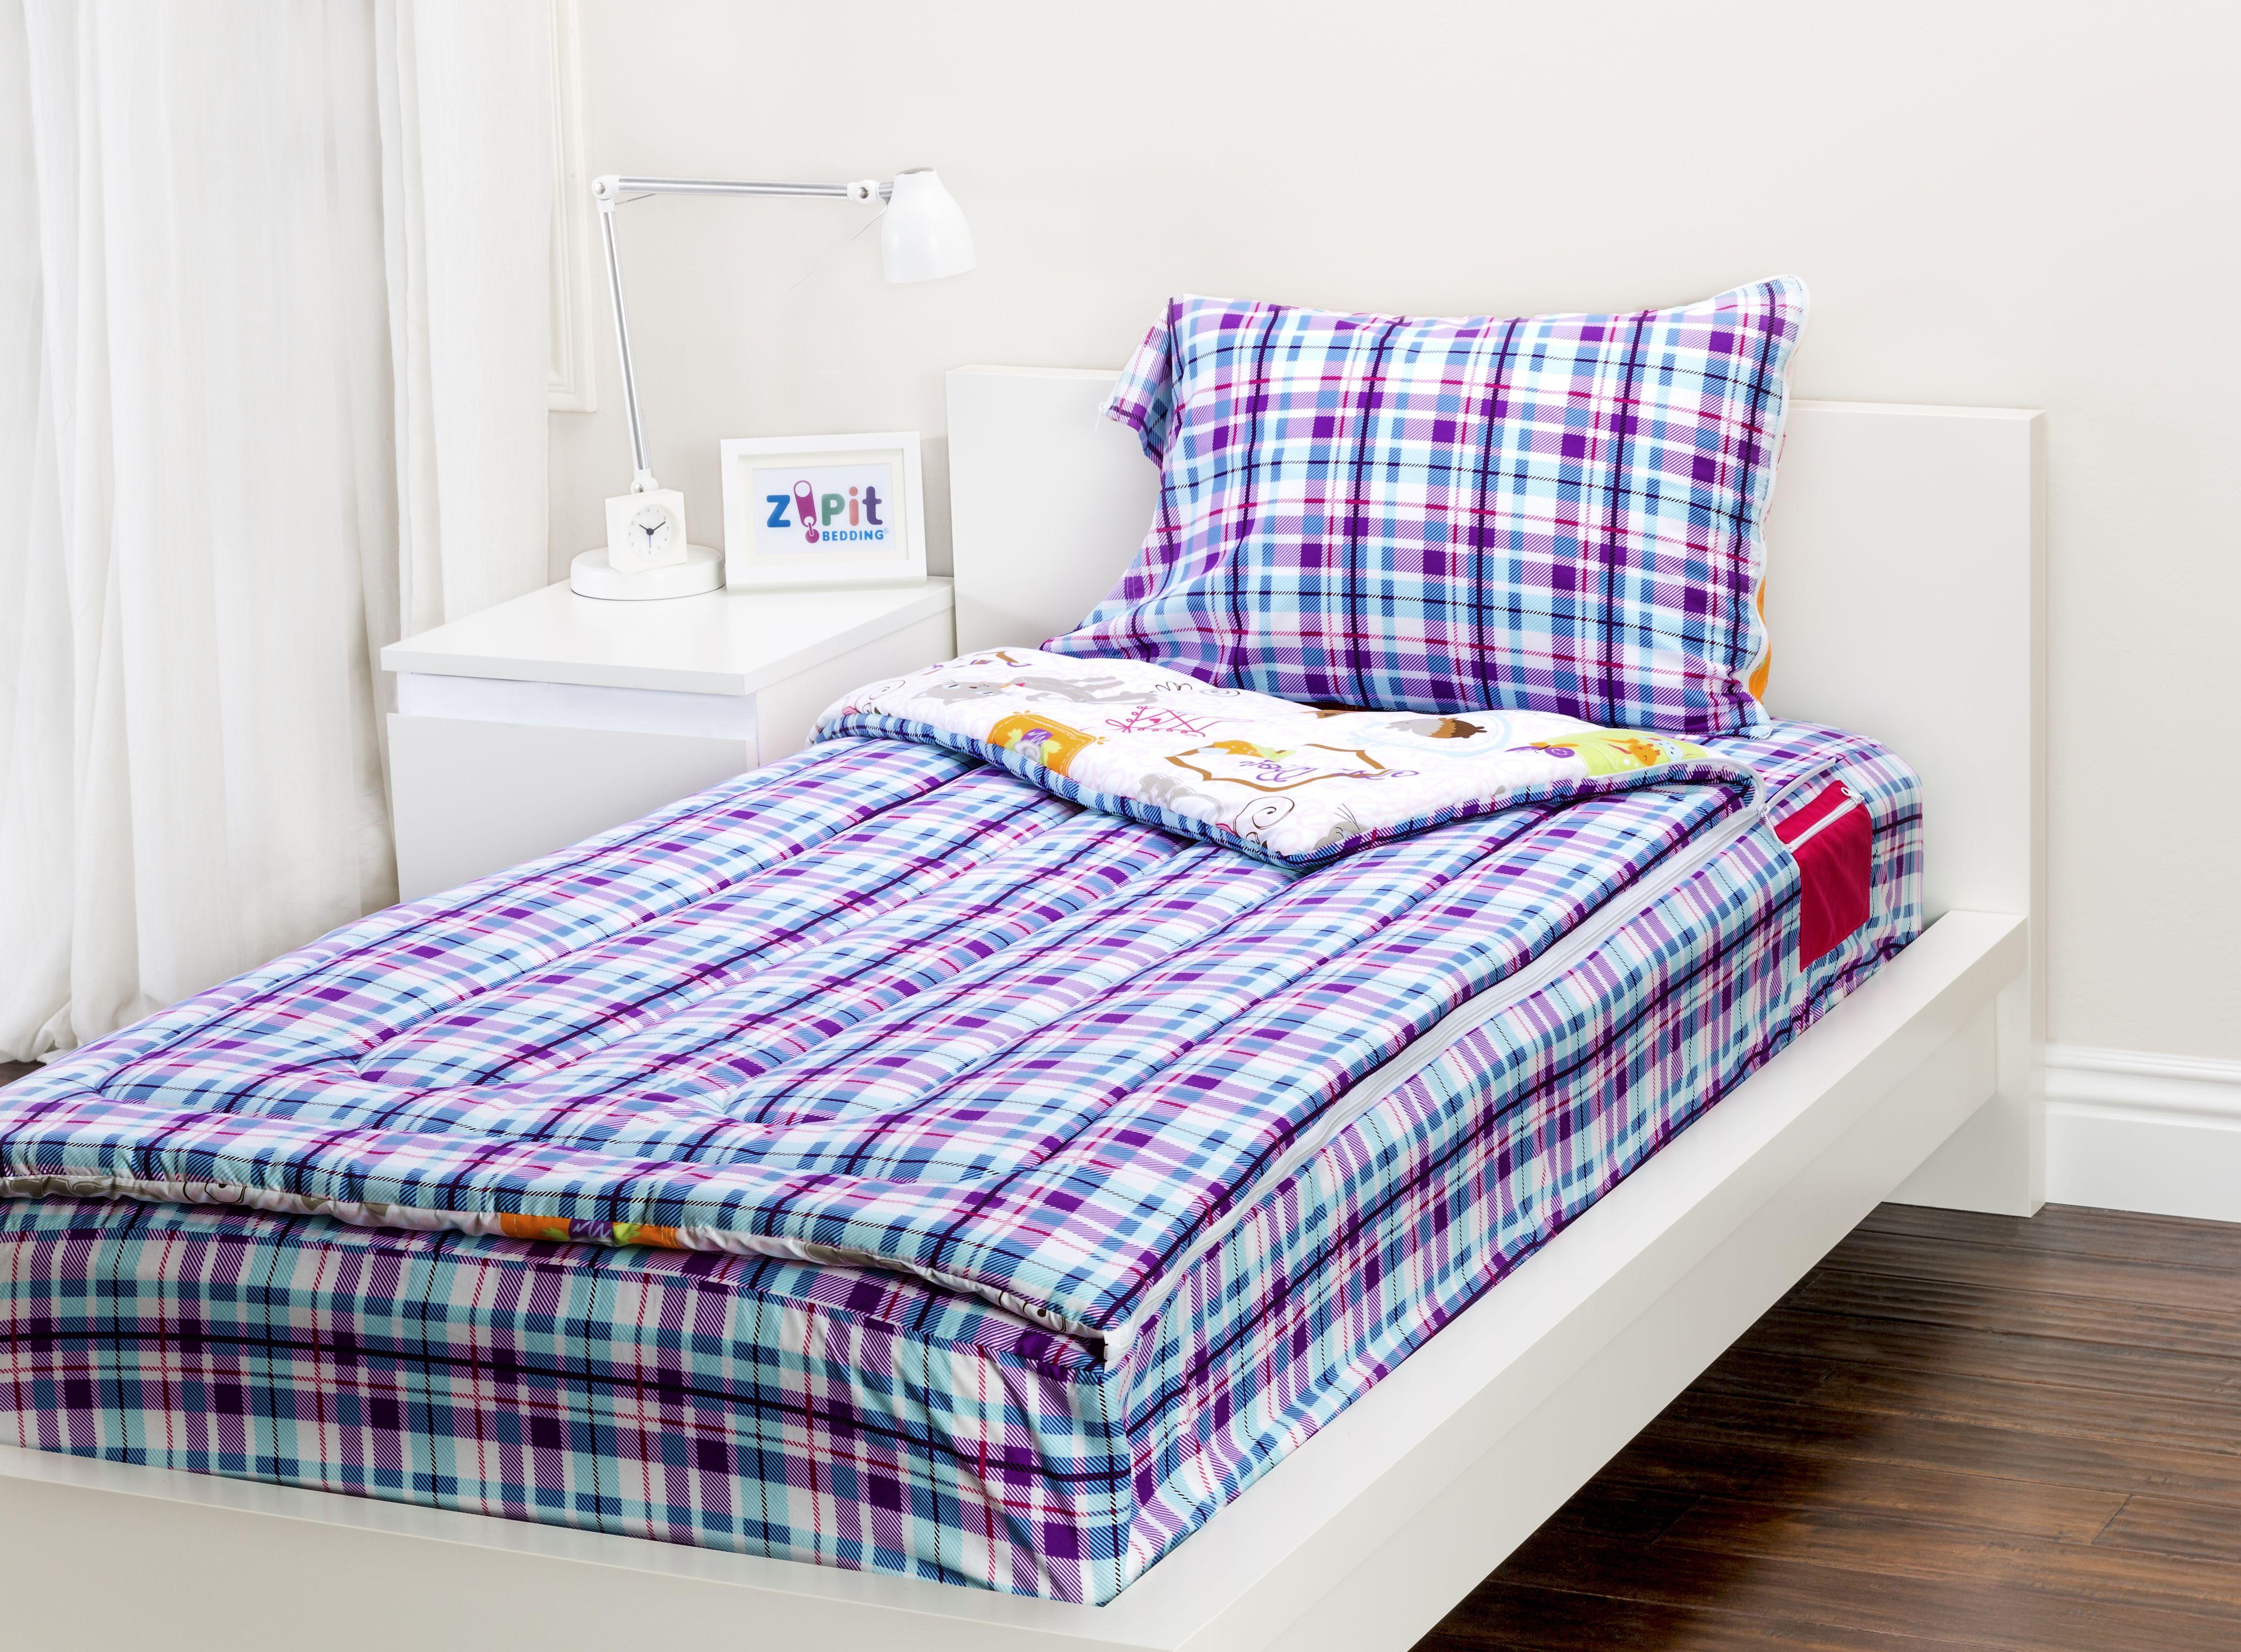 The Sweet Stuff Zipit Bedding Set is reversible. Zipit